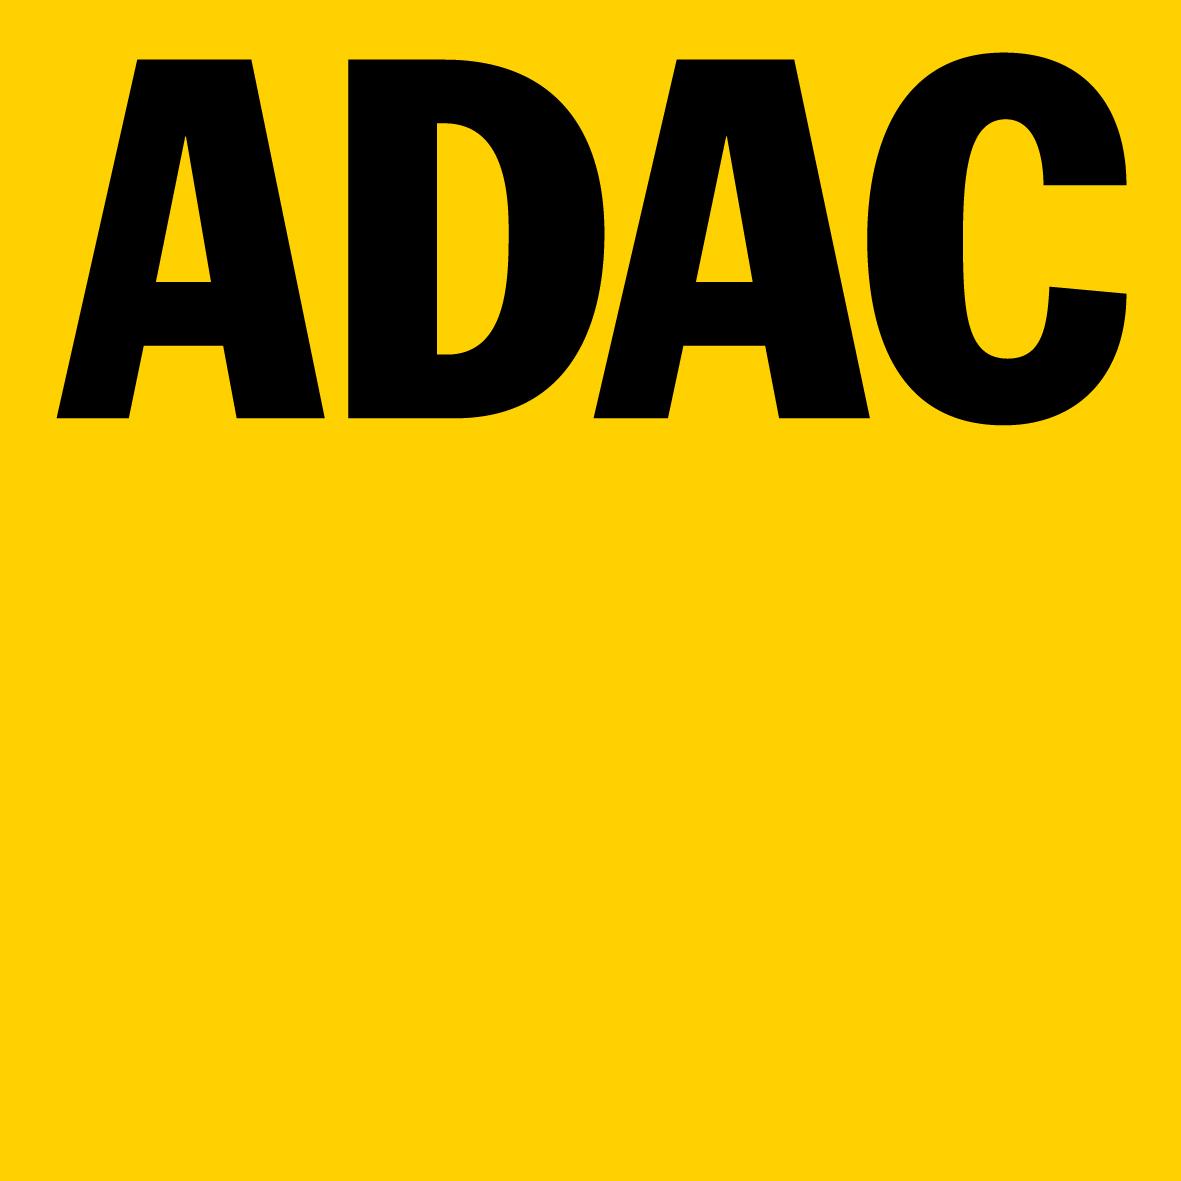 Ardaco Logo photo - 1